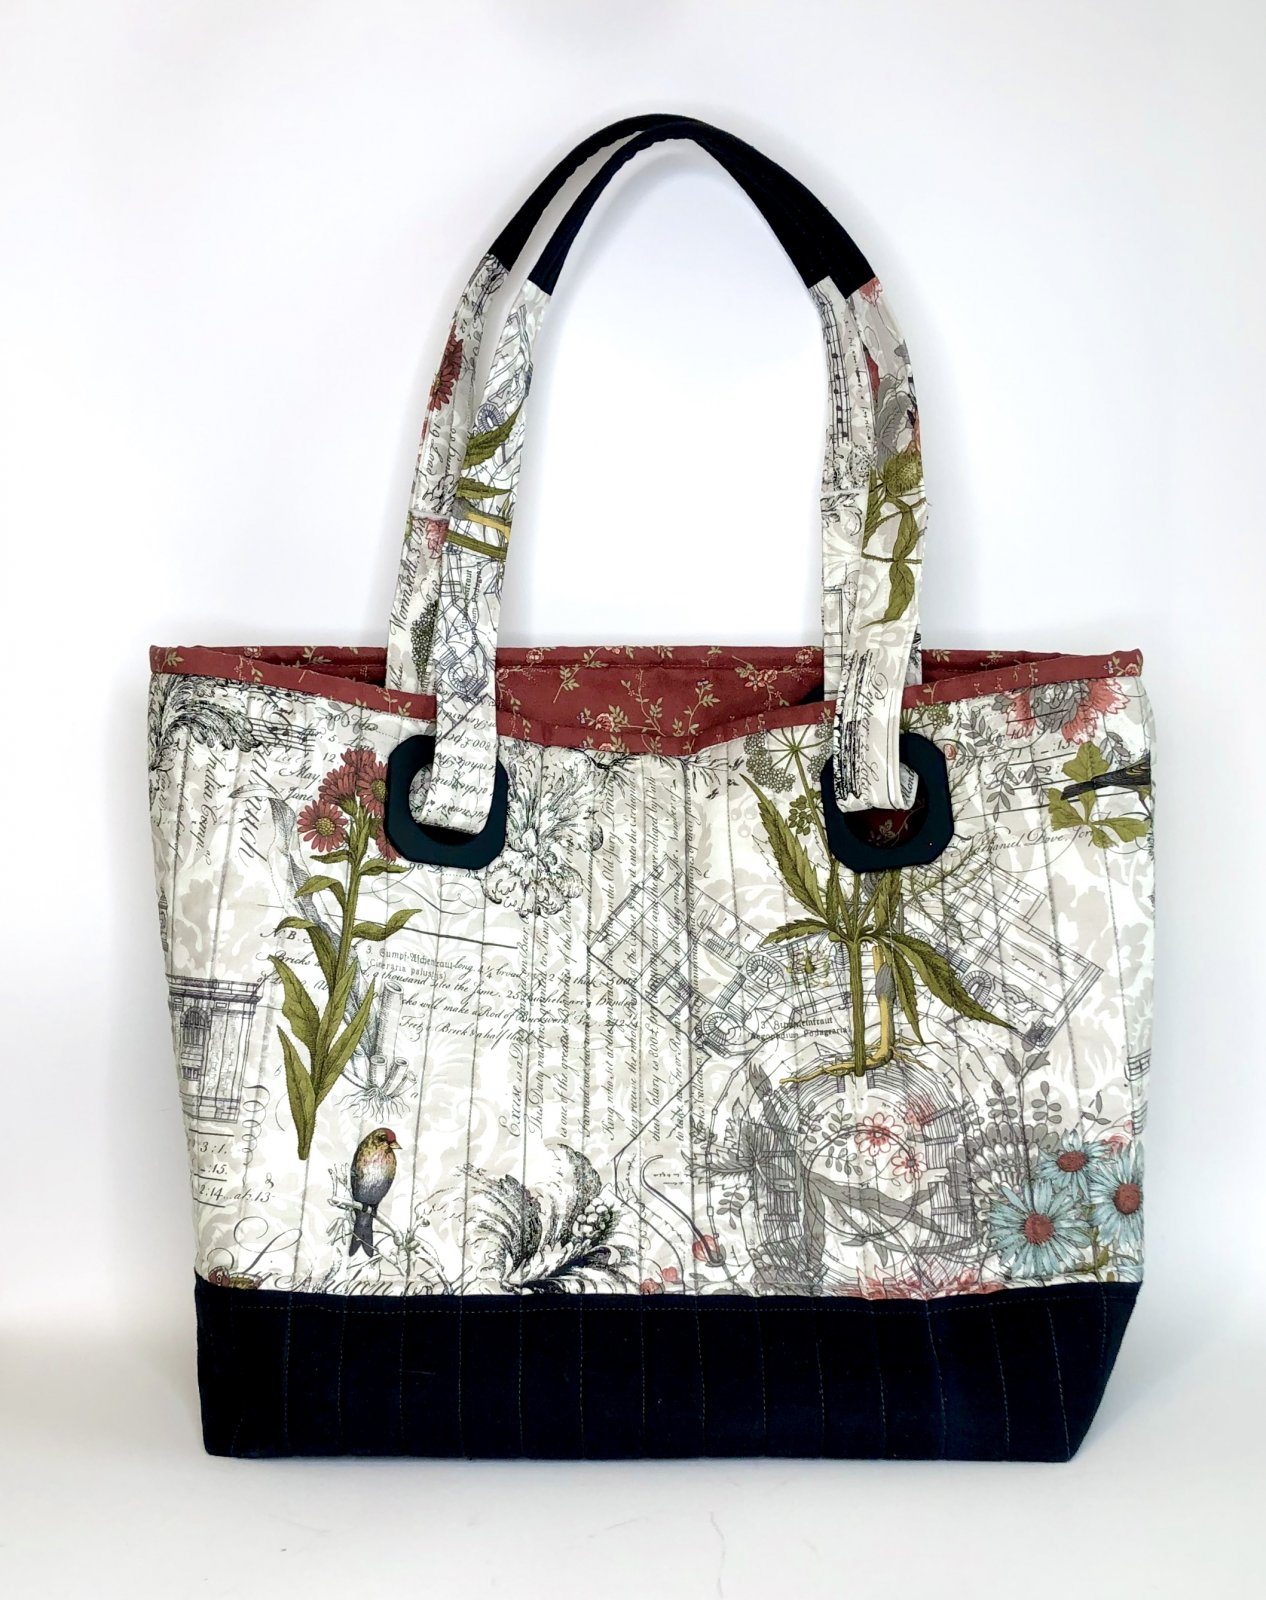 The Big Bag by Bodobo